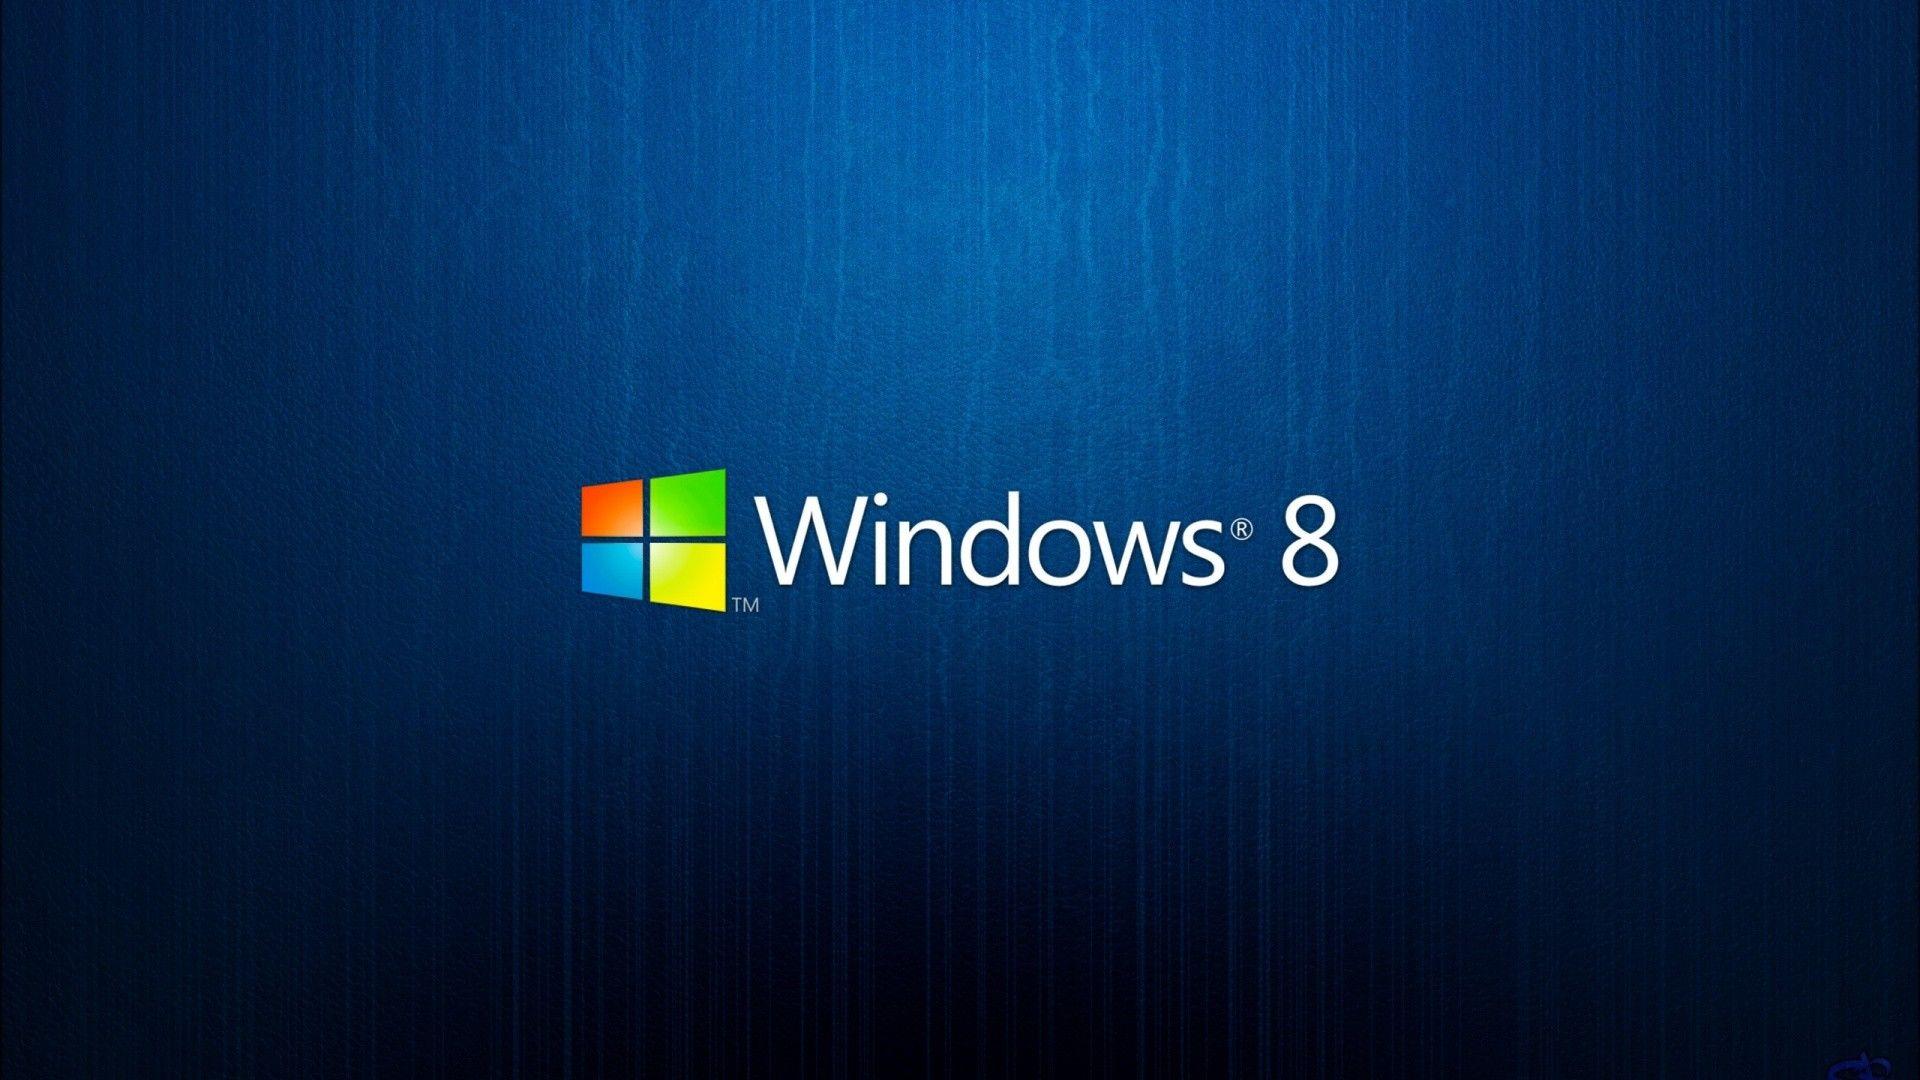 Windows 8 wallpaper desktop free download